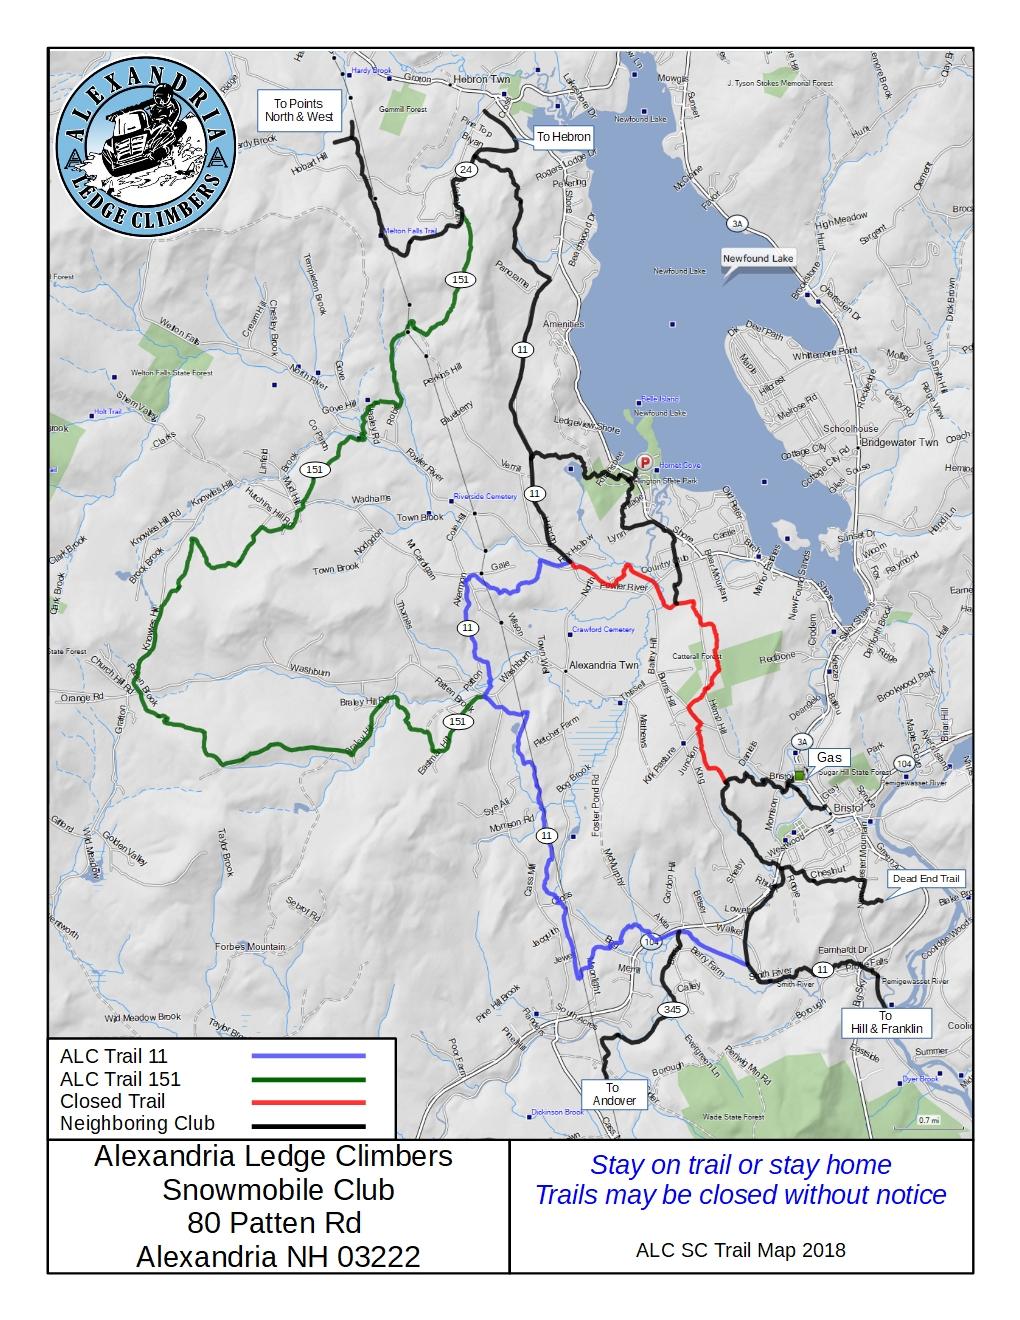 Trail Map   Alexandria Ledge Climbers Snowmobile Club on